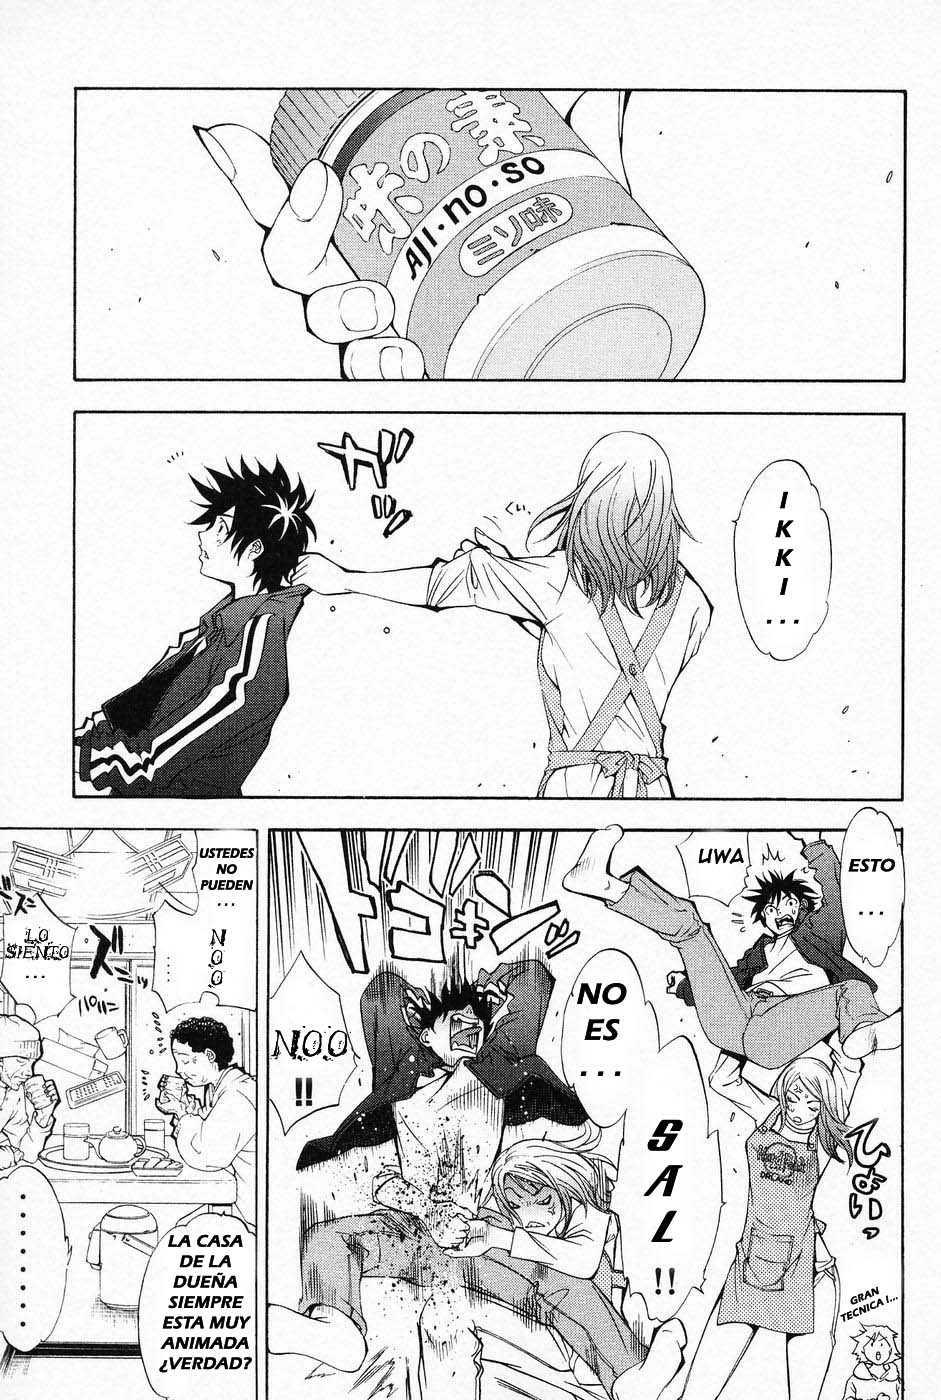 https://c5.ninemanga.com/es_manga/3/67/459683/cc28040cc8f934074161efa2a95d70aa.jpg Page 12